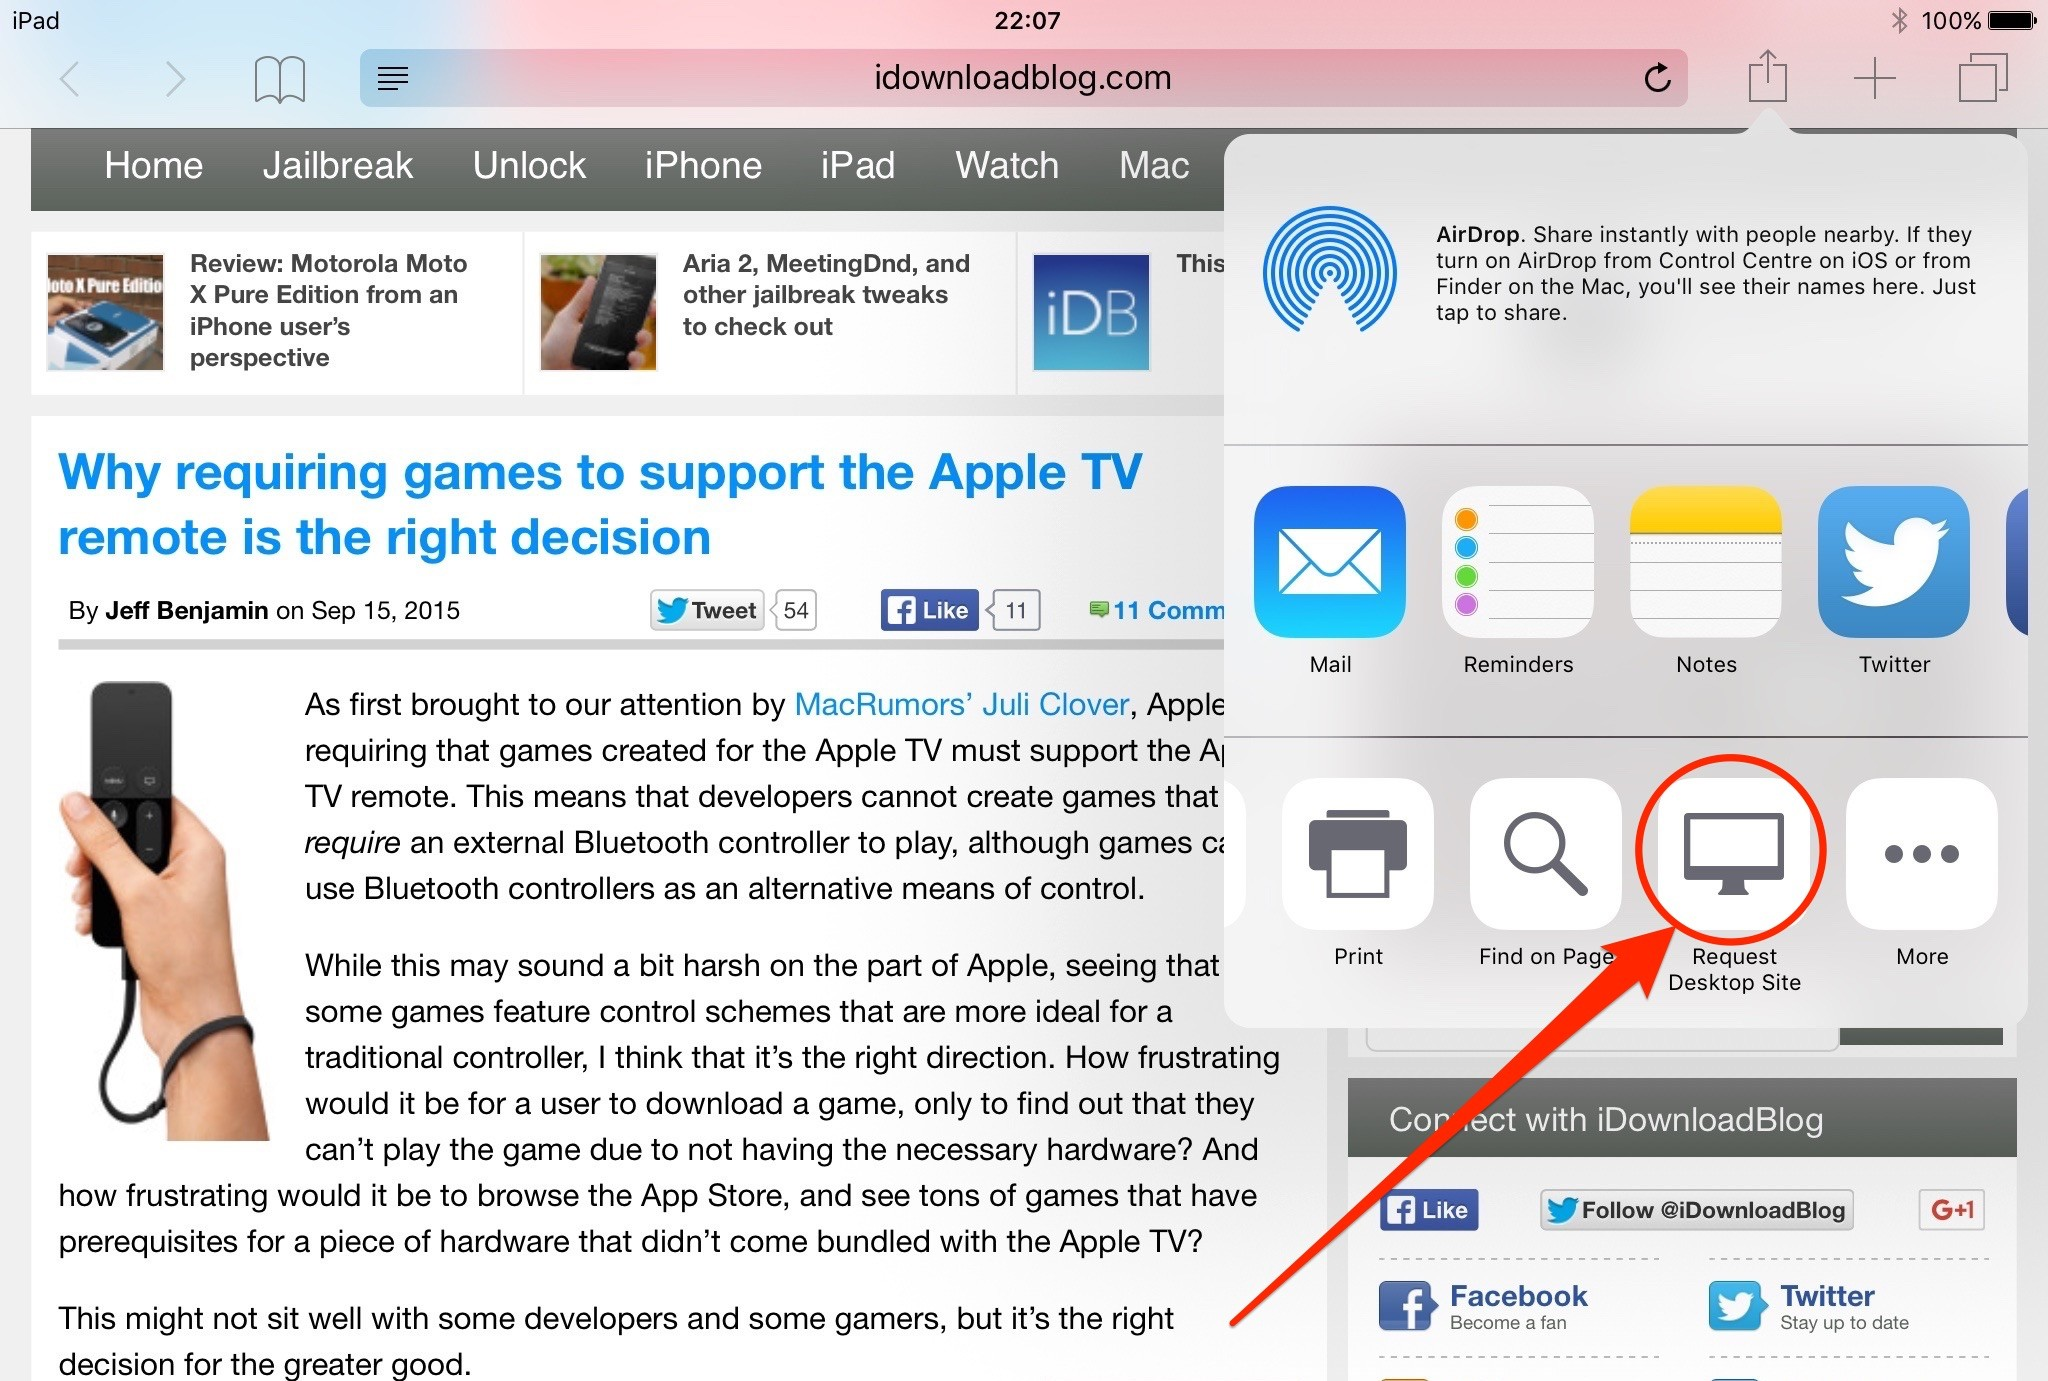 ios 9 request desktop site - Truy cập phiên bản Desktop của website trên iOS 9